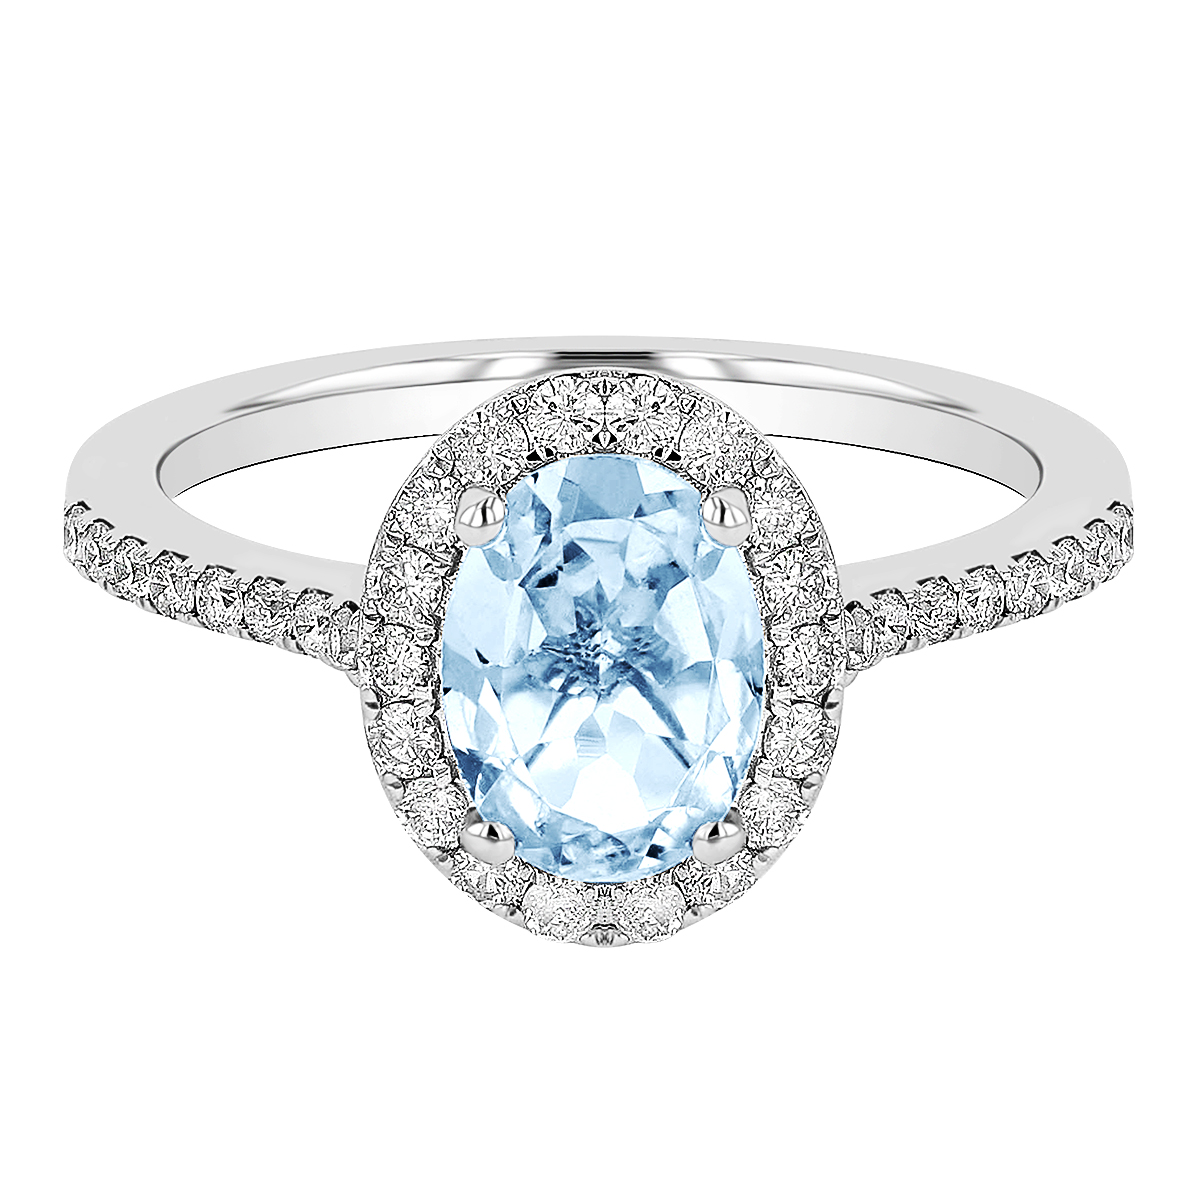 Rosa Mer Collection 0.87ct Oval Aquamarine & Diamond Halo Ring